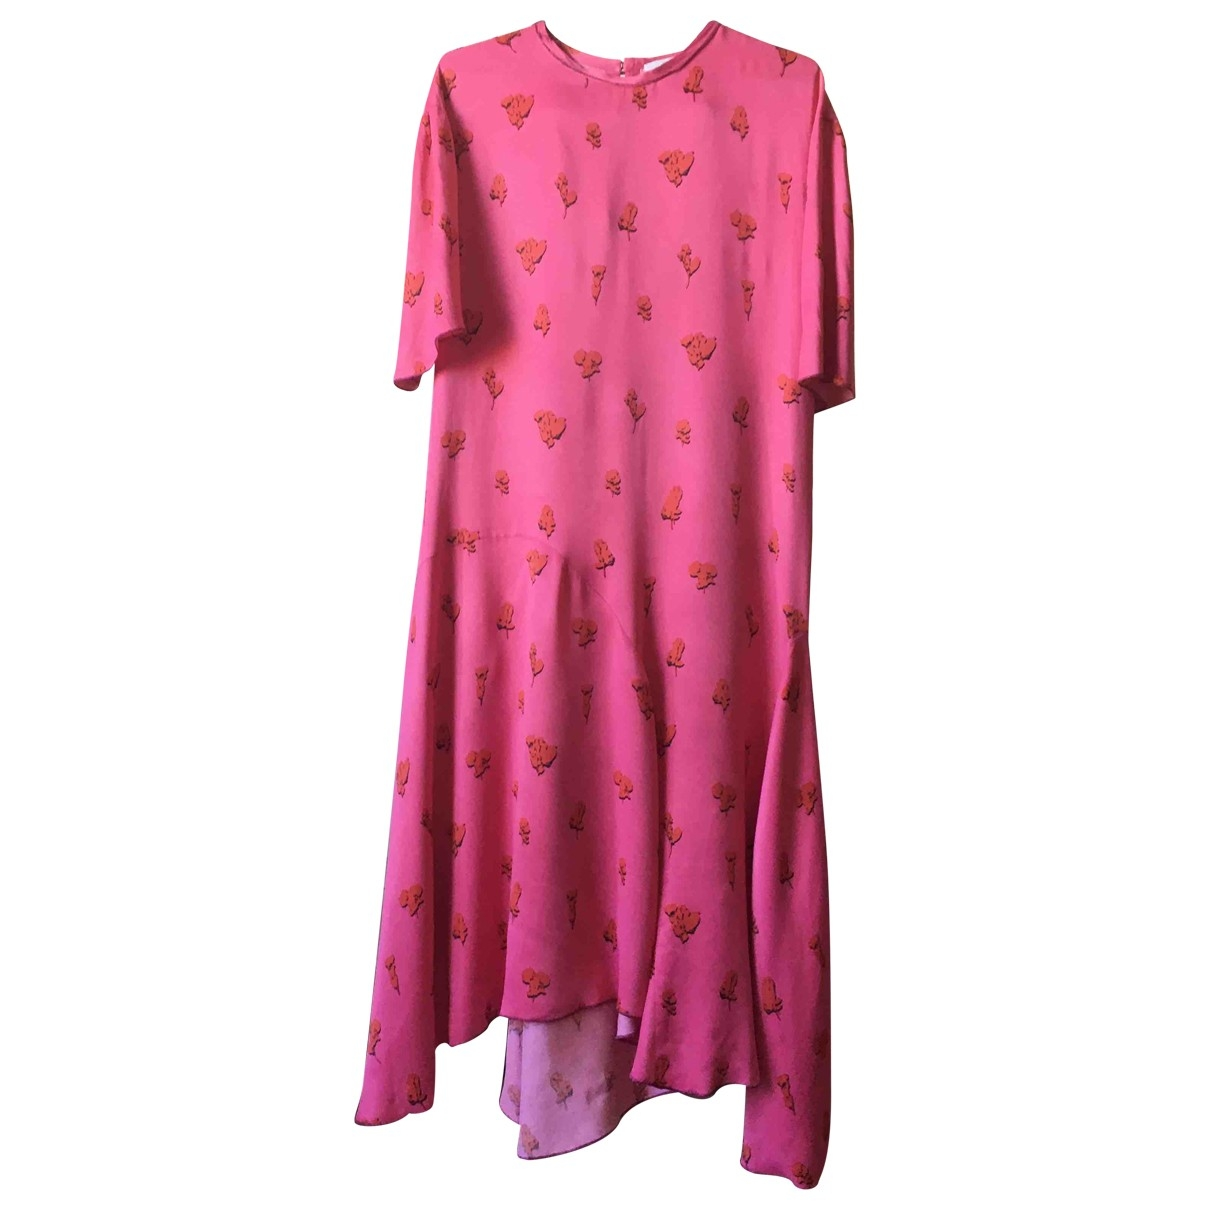 Bimba Y Lola \N Pink dress for Women M International